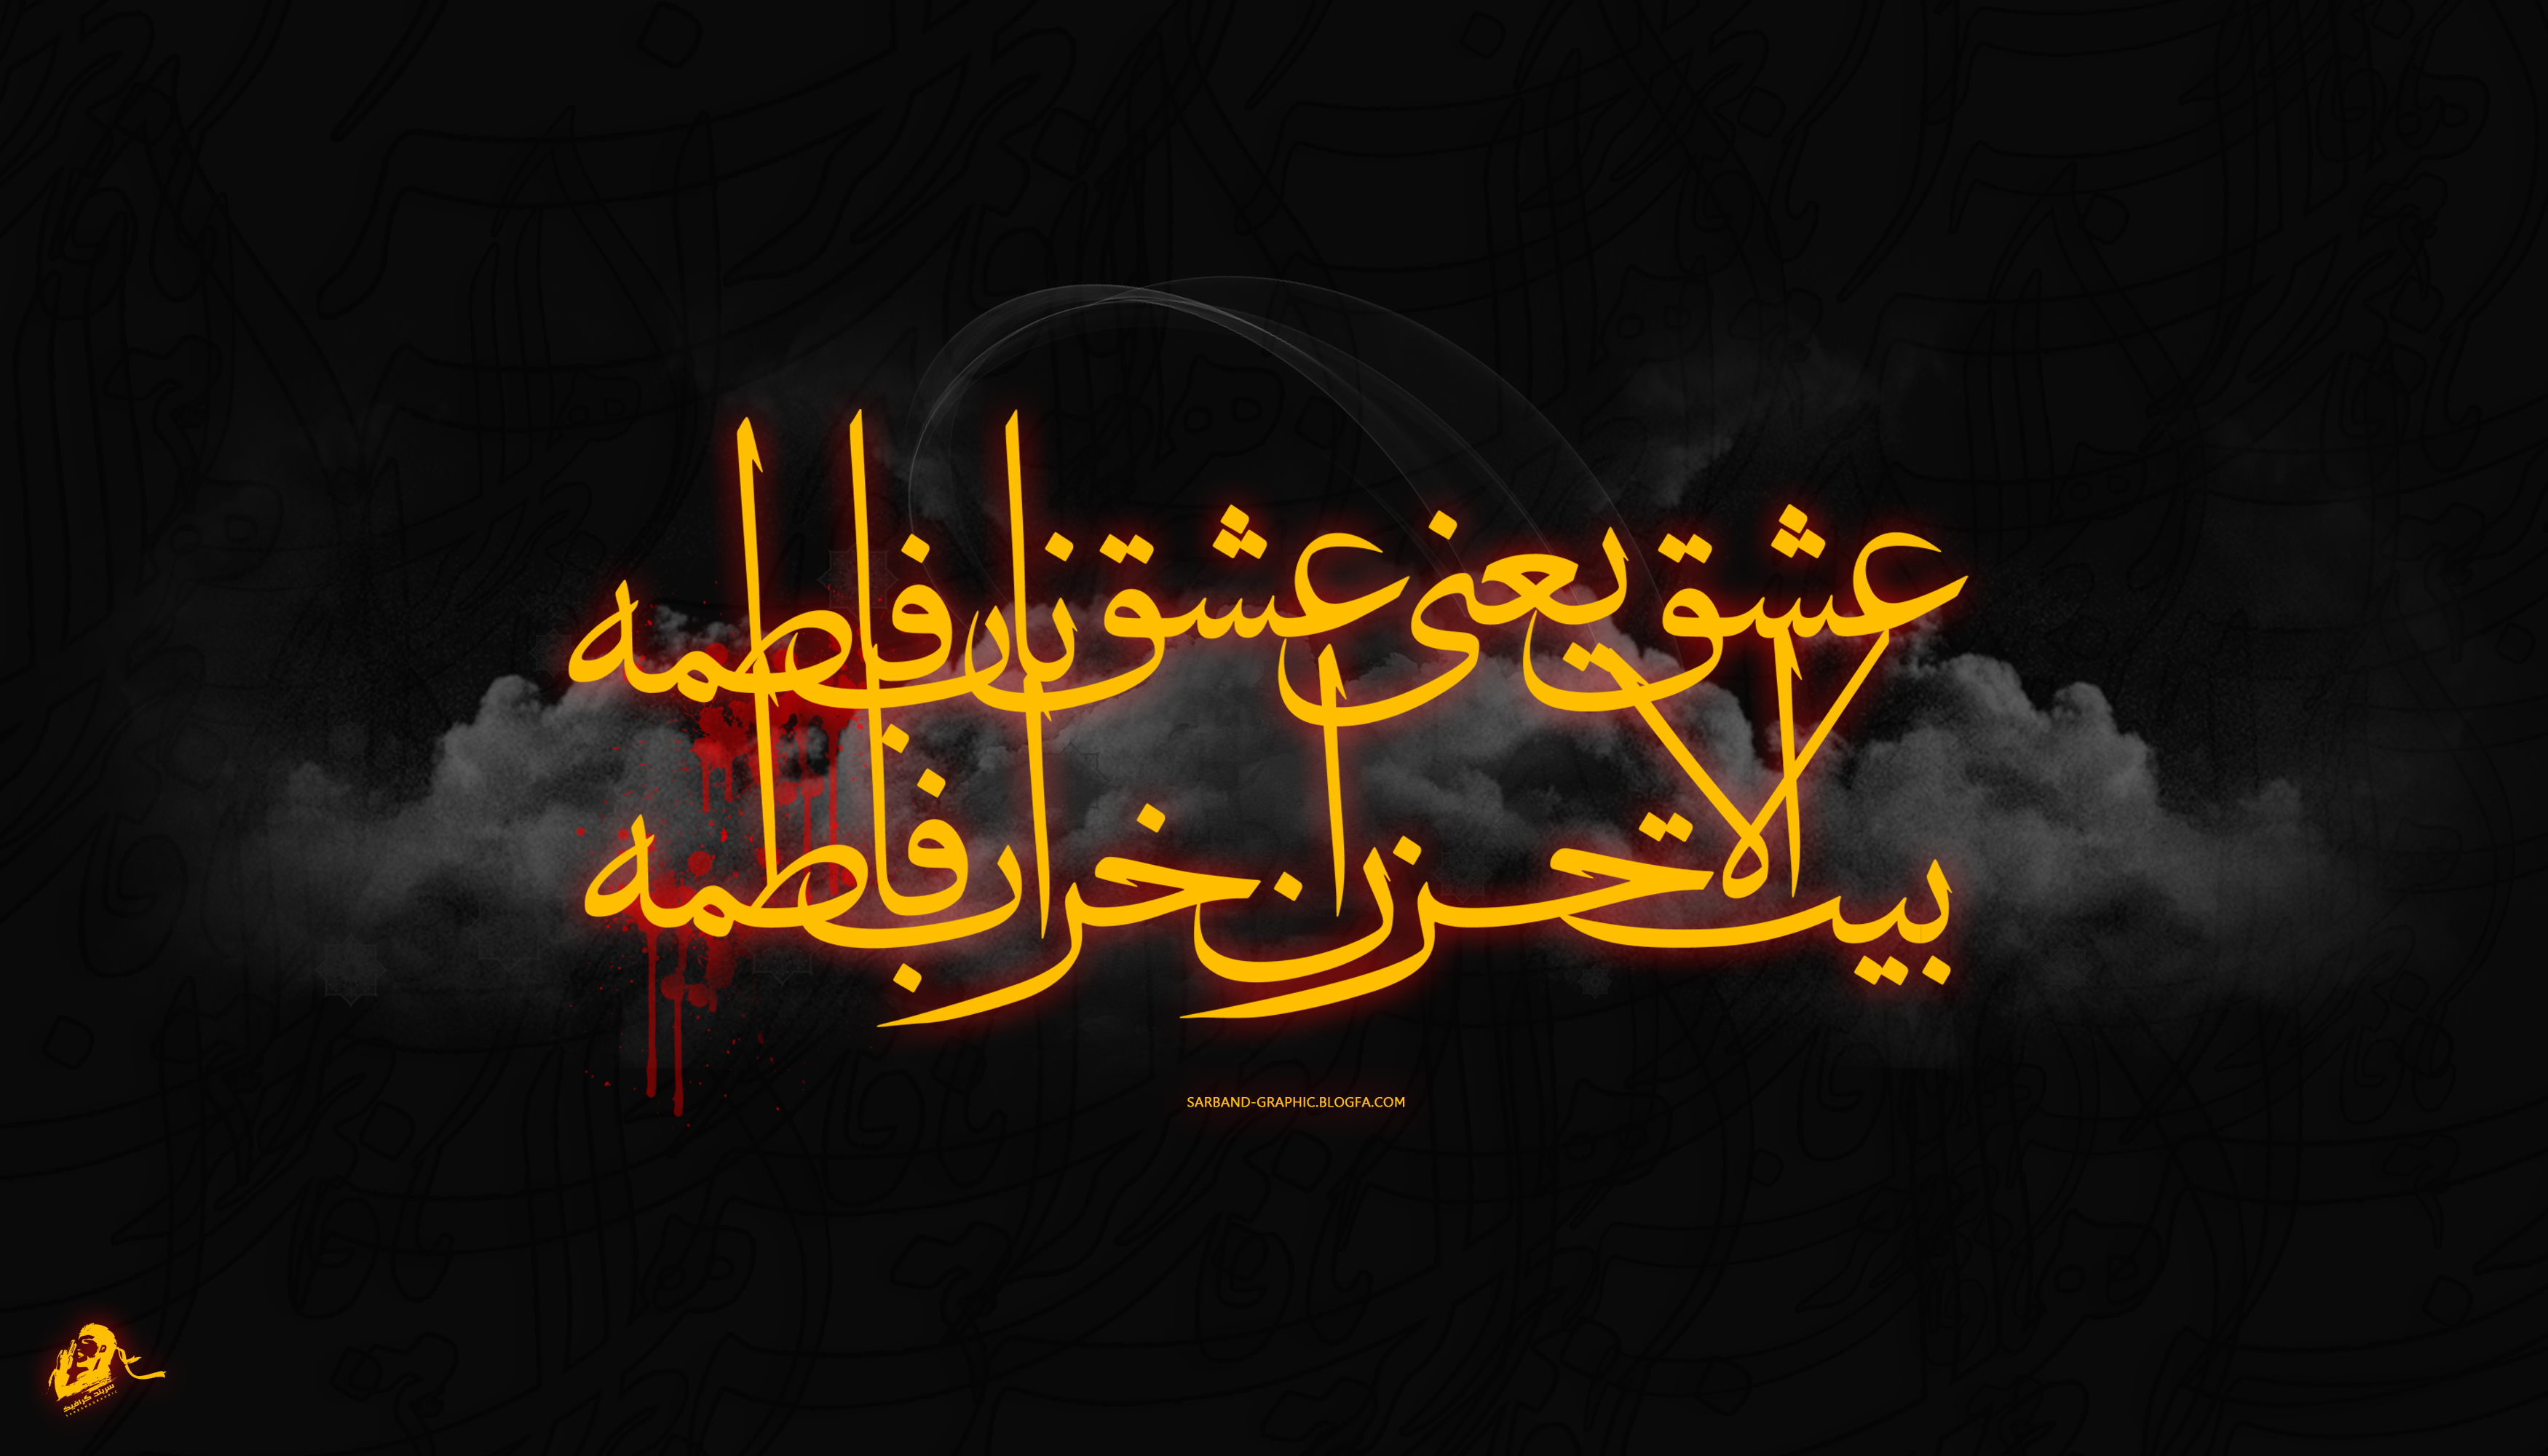 تصویر زمینه شهادت حضرت فاطمه زهرا,عکس ایام فاطمیه,پوستر